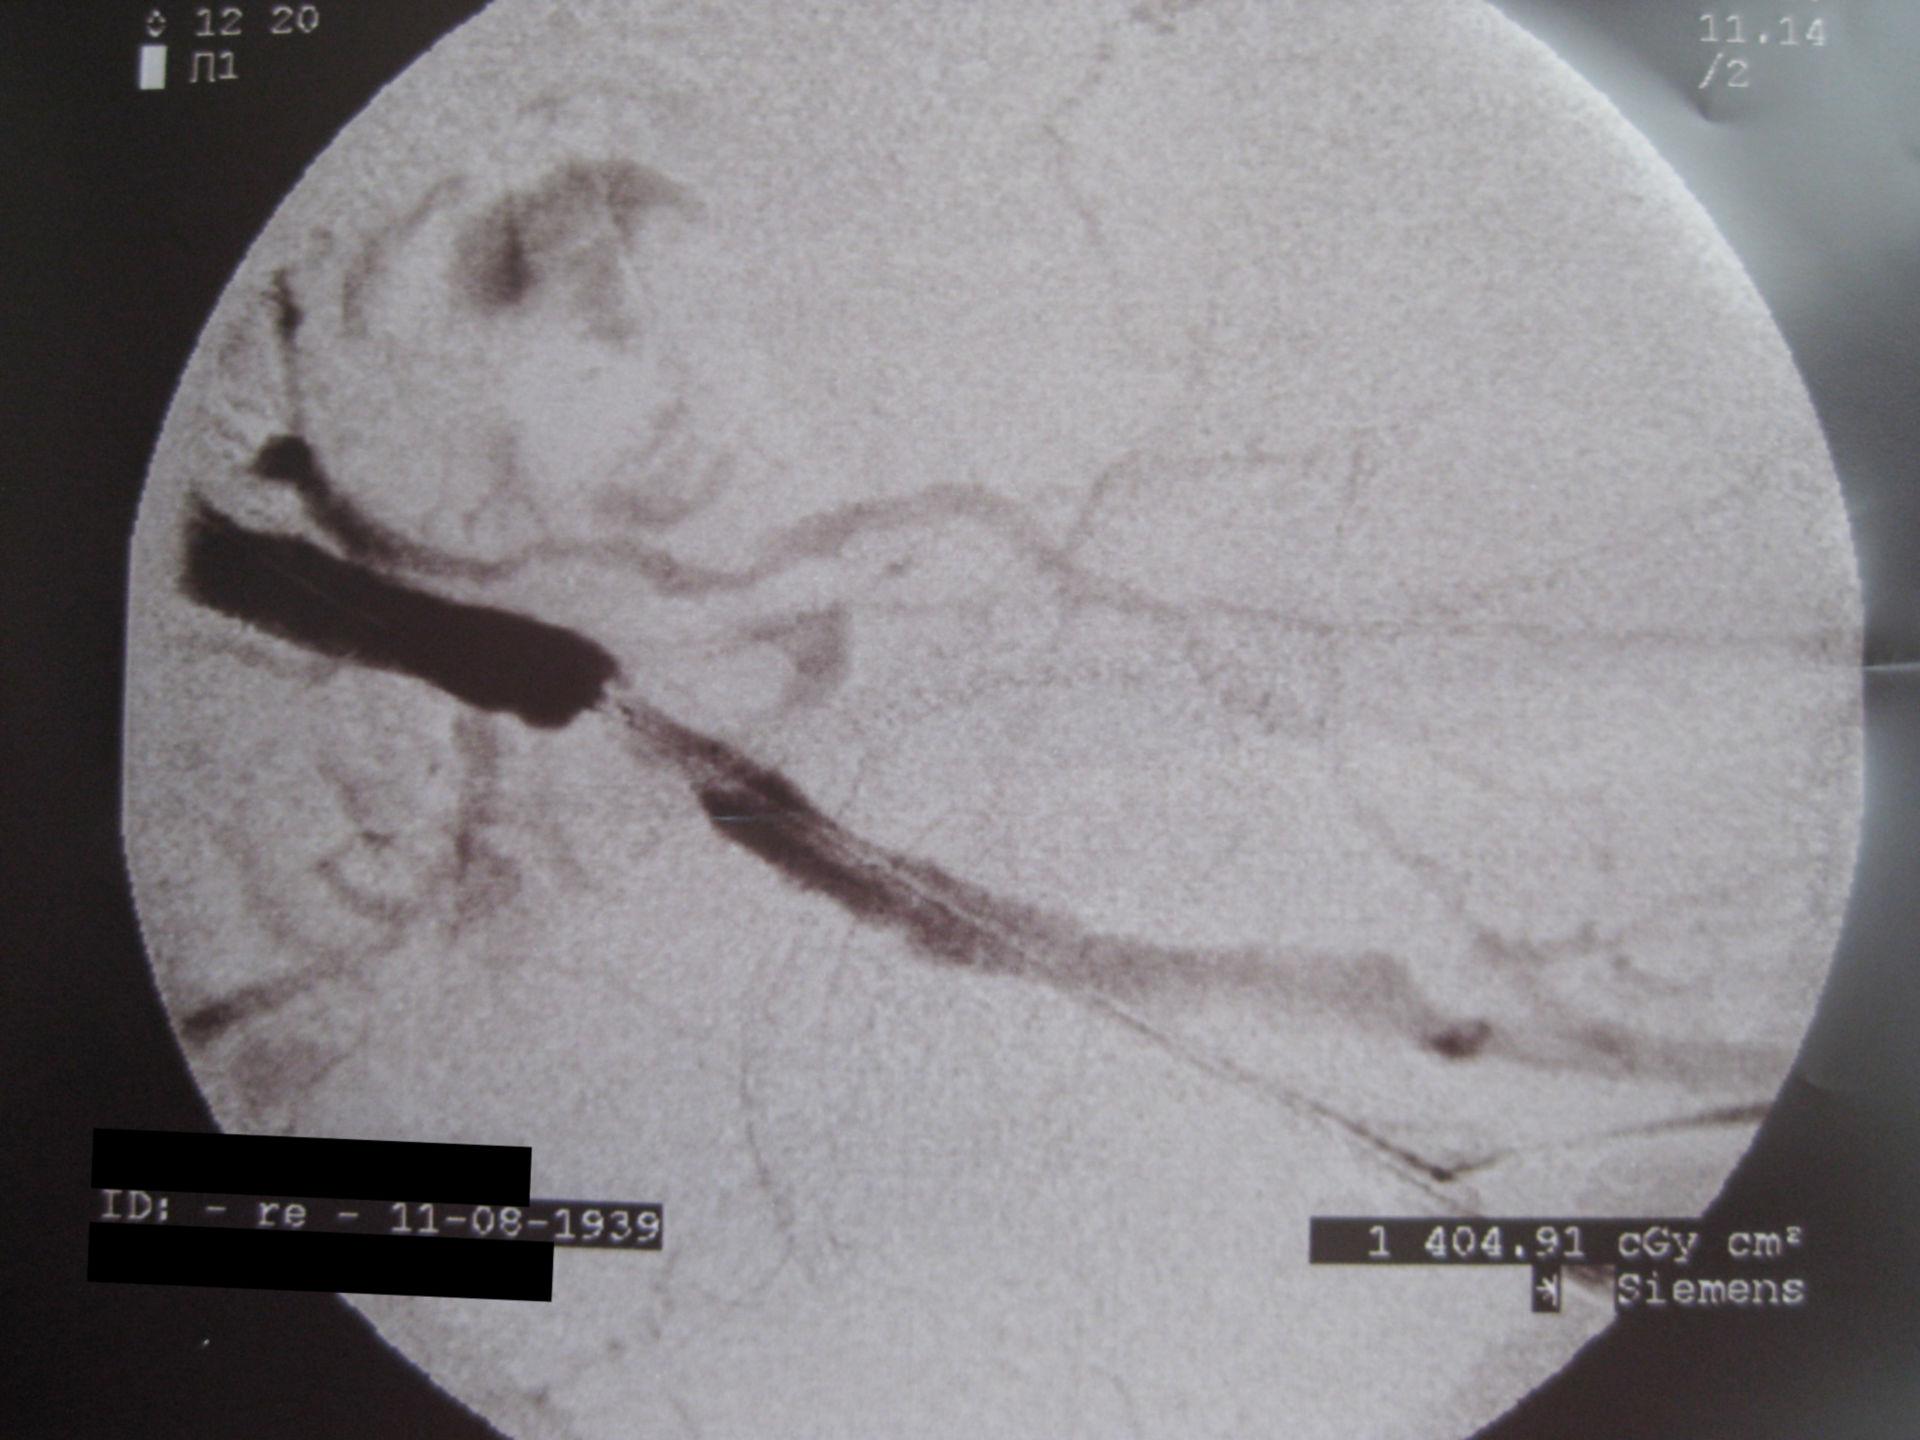 Profound stenosis of the iliac artery - DSA